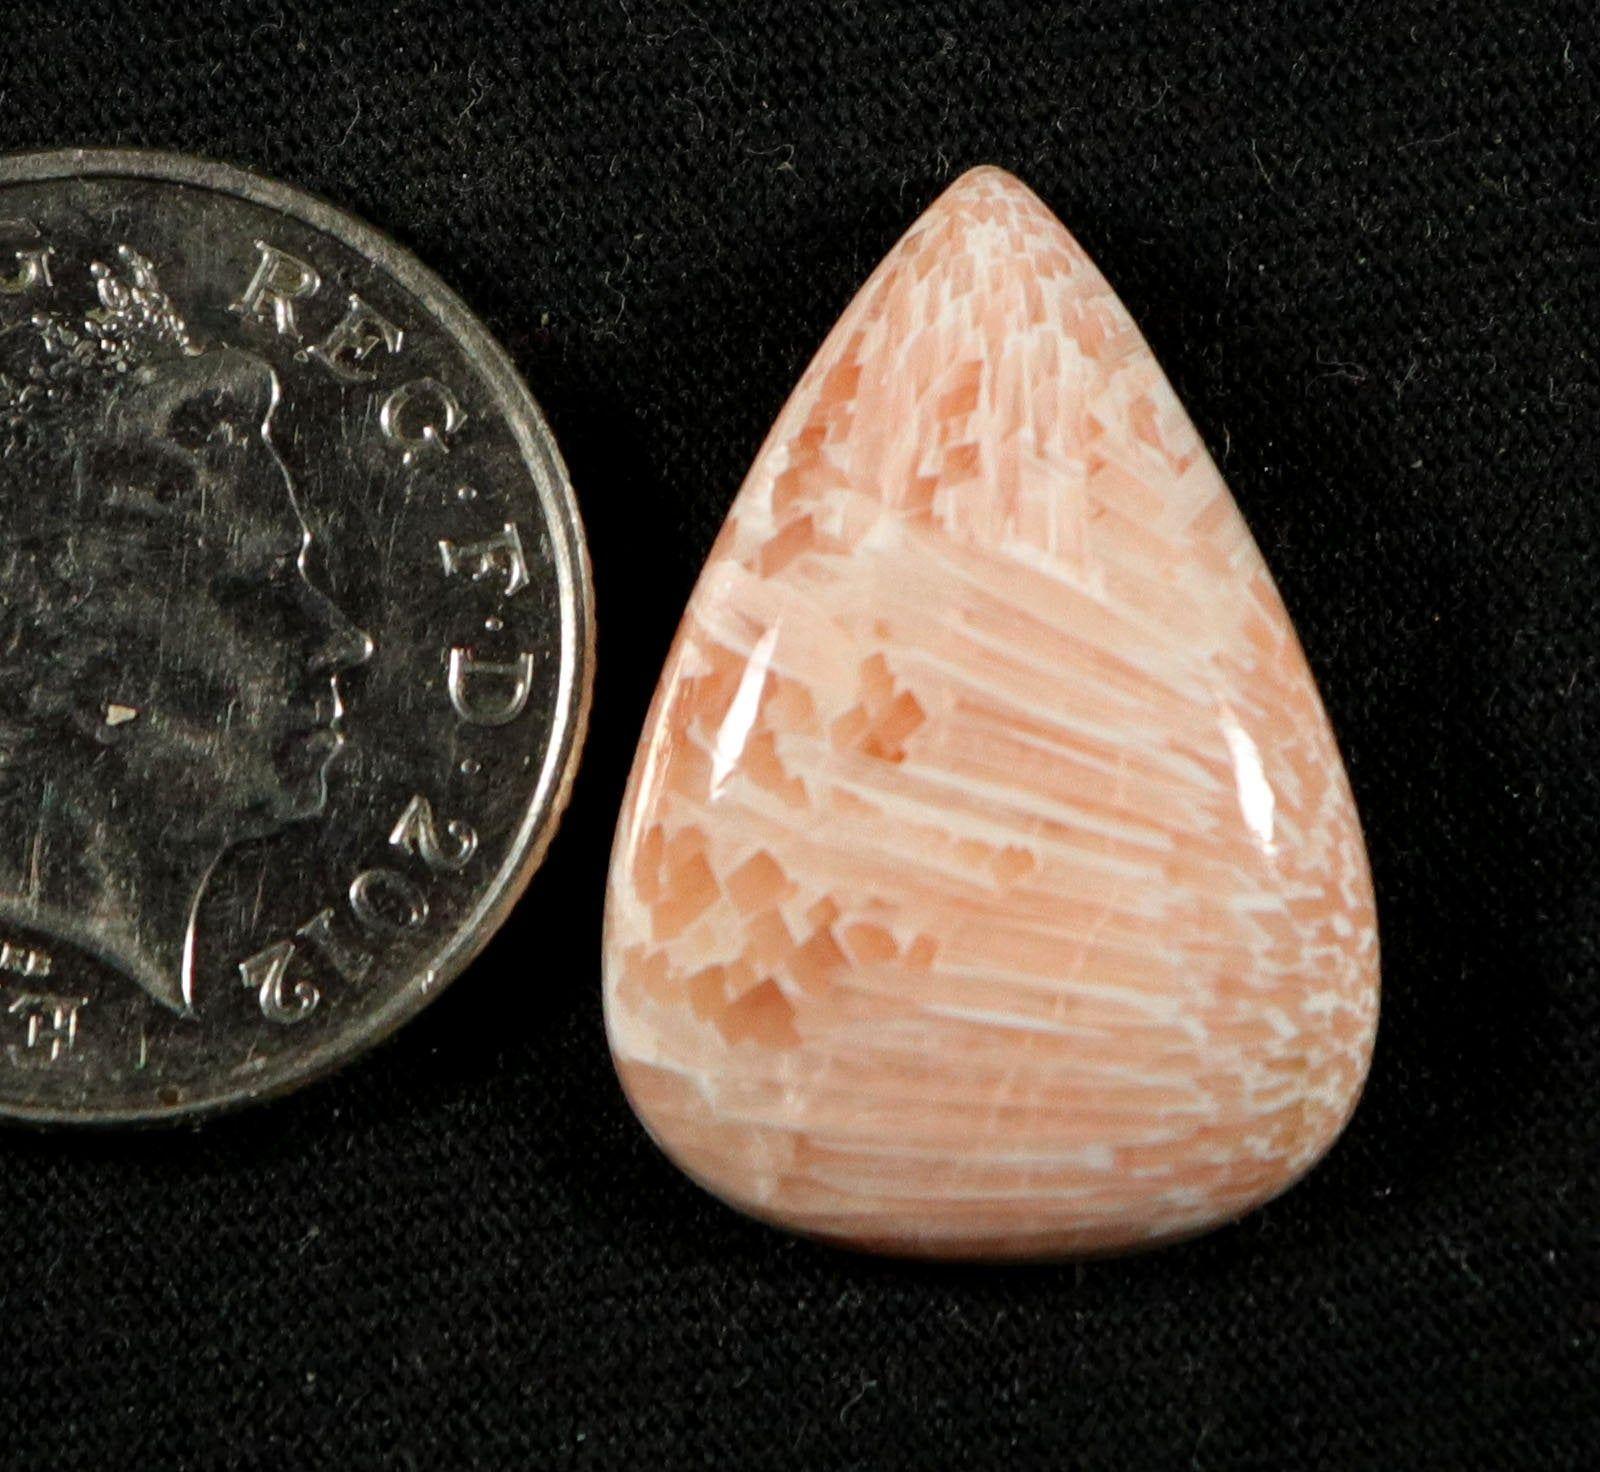 9X7 MM Cabochon Smooth Flat Bottom Jewelry Making Loose Gemstone African Amethyst Smooth Gemstone African Amethyst Pear Shape 21 Pcs Approx